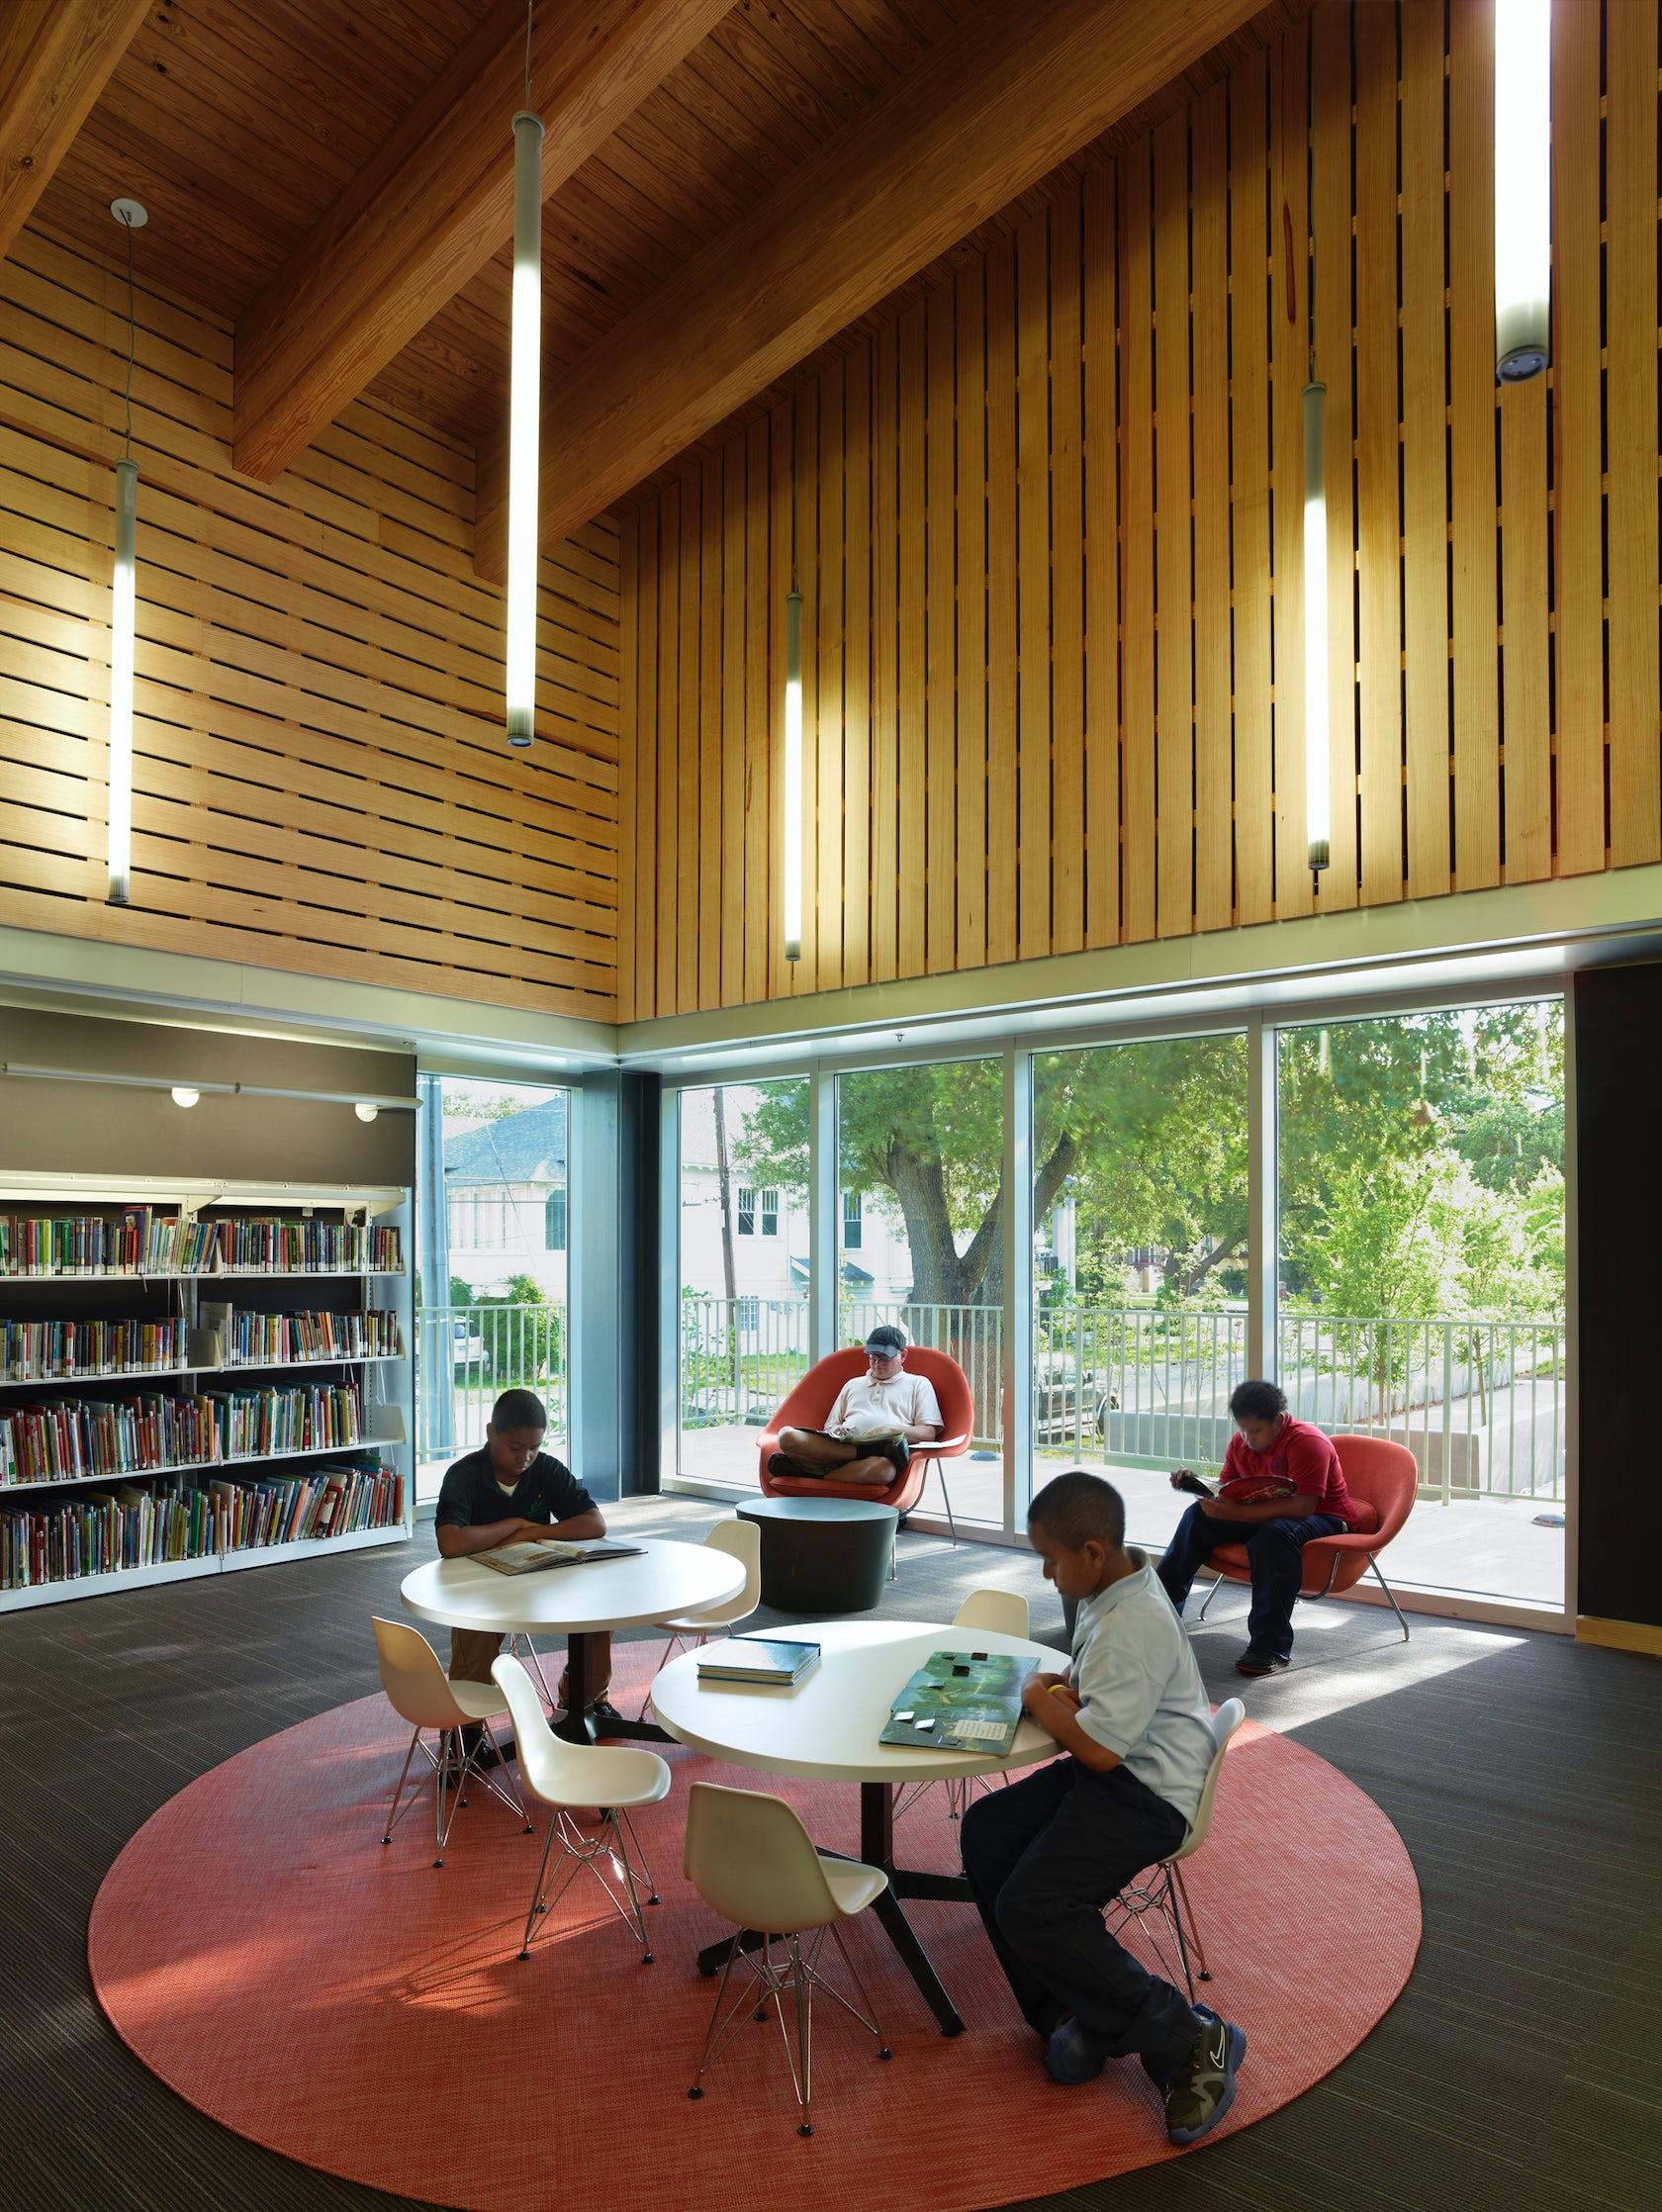 St Paul Park Auto >> Rosa F. Keller Library & Community Center - Architizer